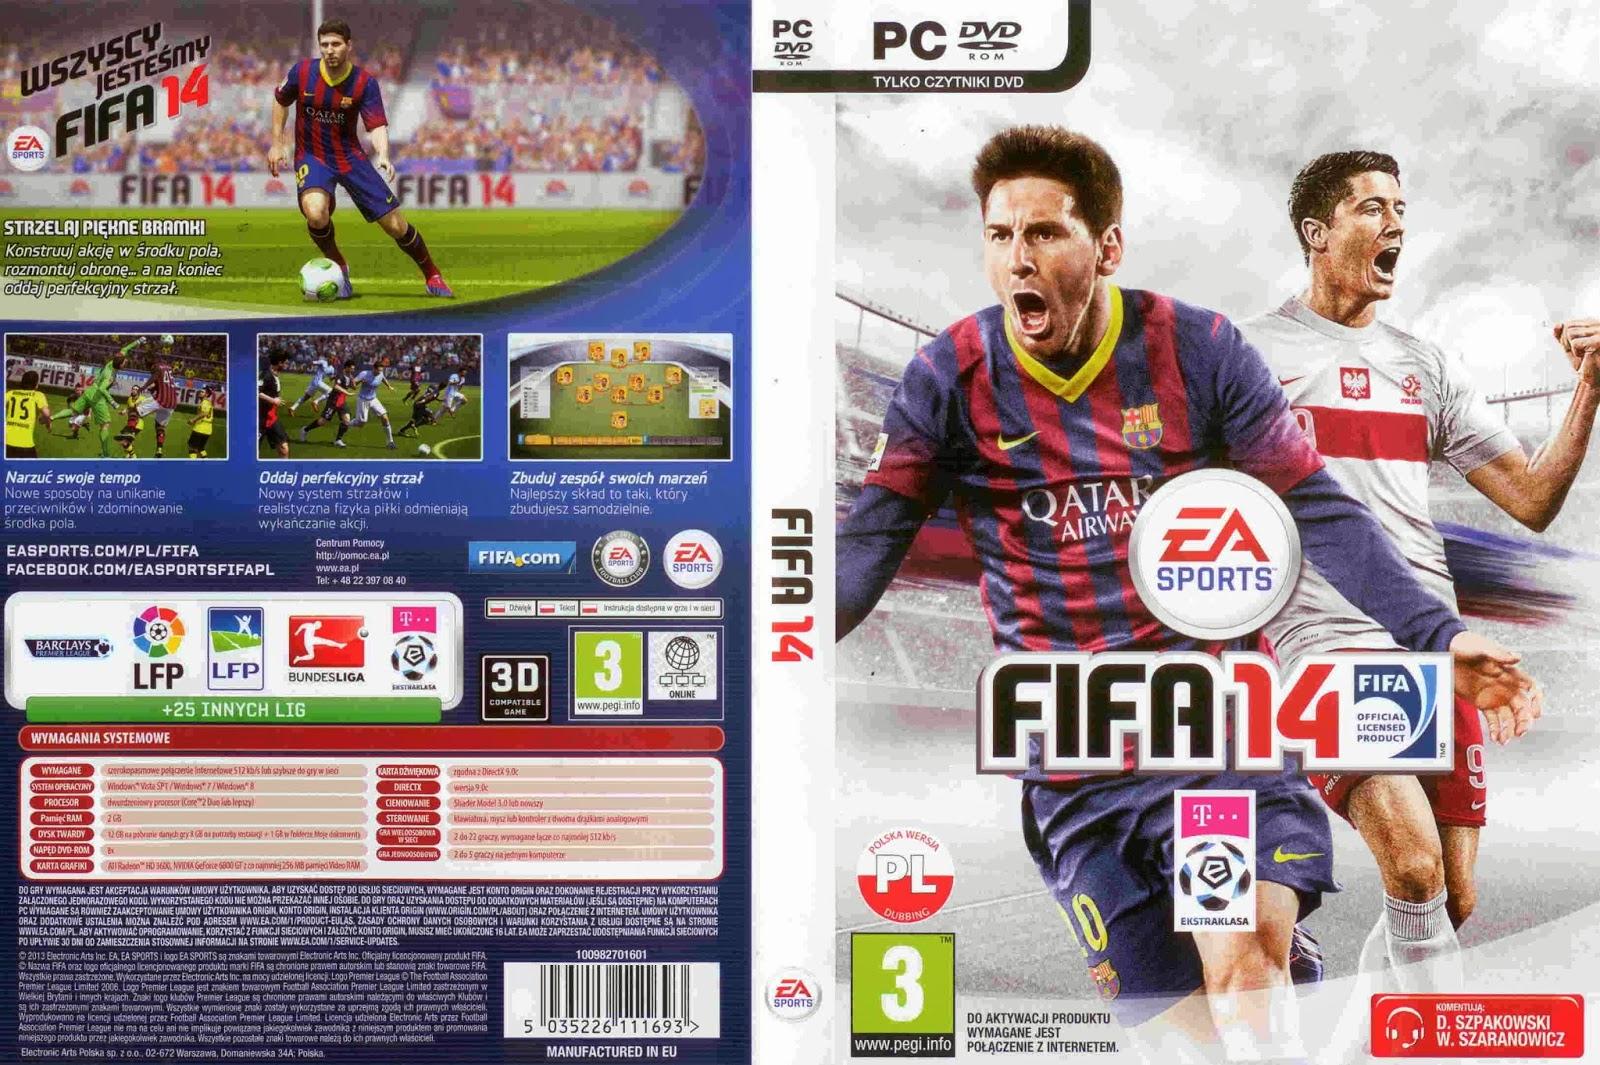 http://1.bp.blogspot.com/-dDNWOUIQFHQ/UssxhibgWFI/AAAAAAAAZR4/bB8LO1XqZcY/s1600/FIFA+14+POLISH+-+Cover+PC+Game.jpg